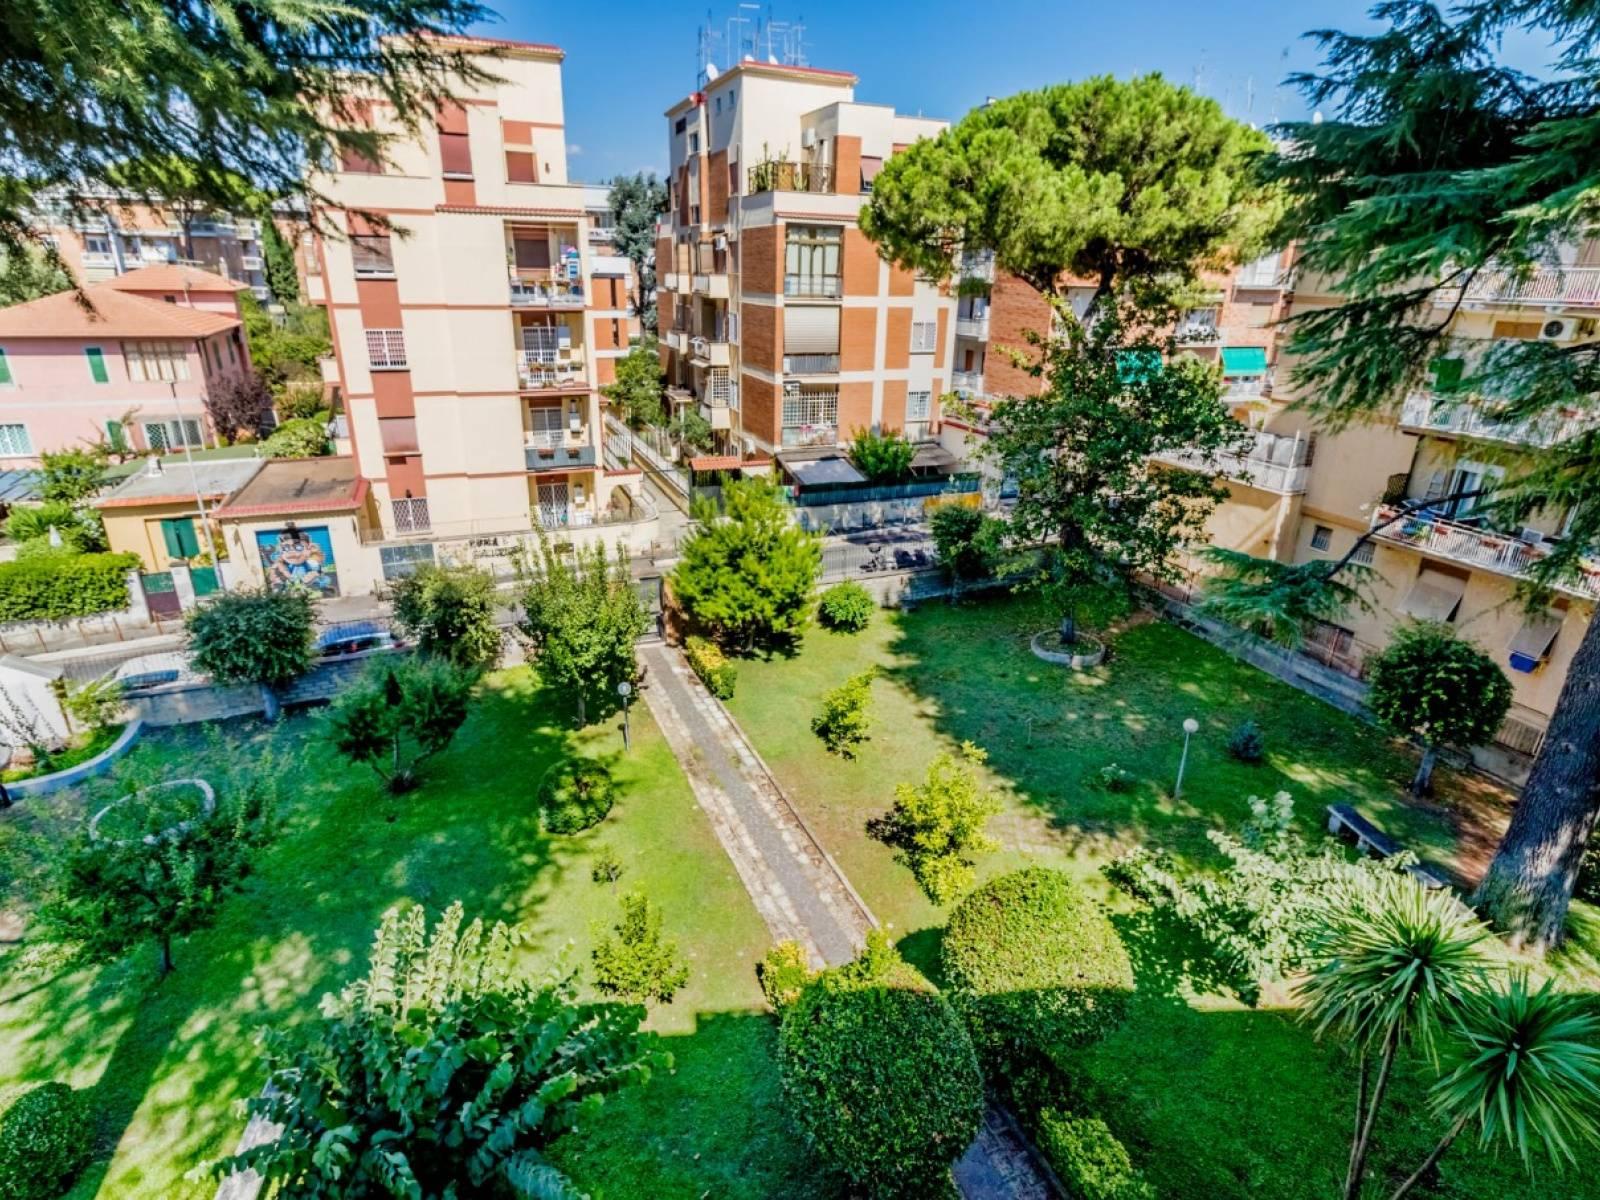 1118419225 Pentalocale in Via Simone Mosca, Roma, Zona Torrevecchia